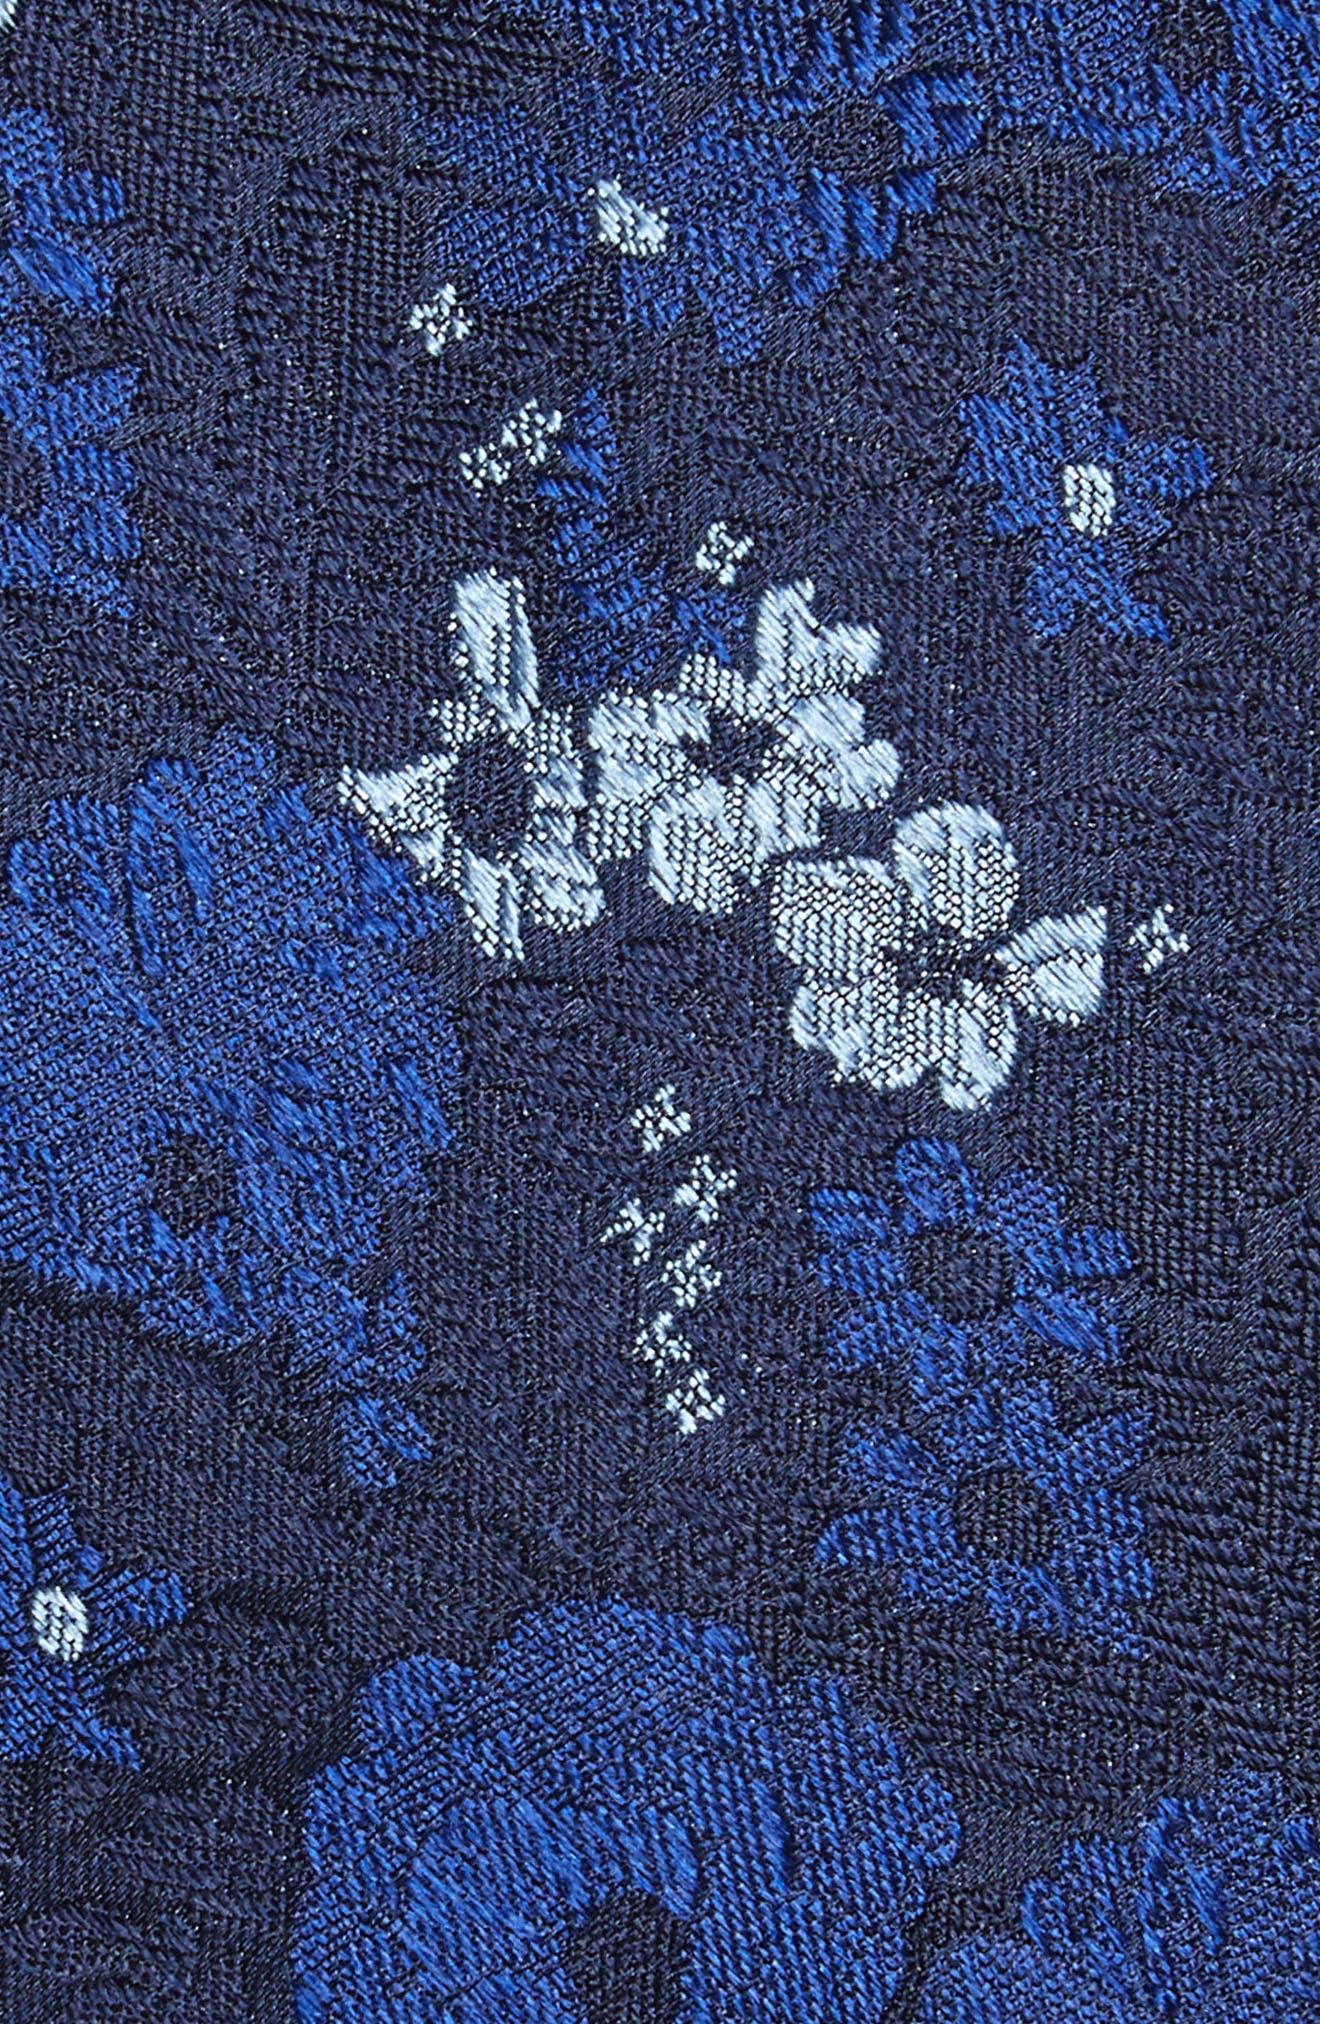 Jerin Floral Silk Tie,                             Alternate thumbnail 2, color,                             DARK NAVY